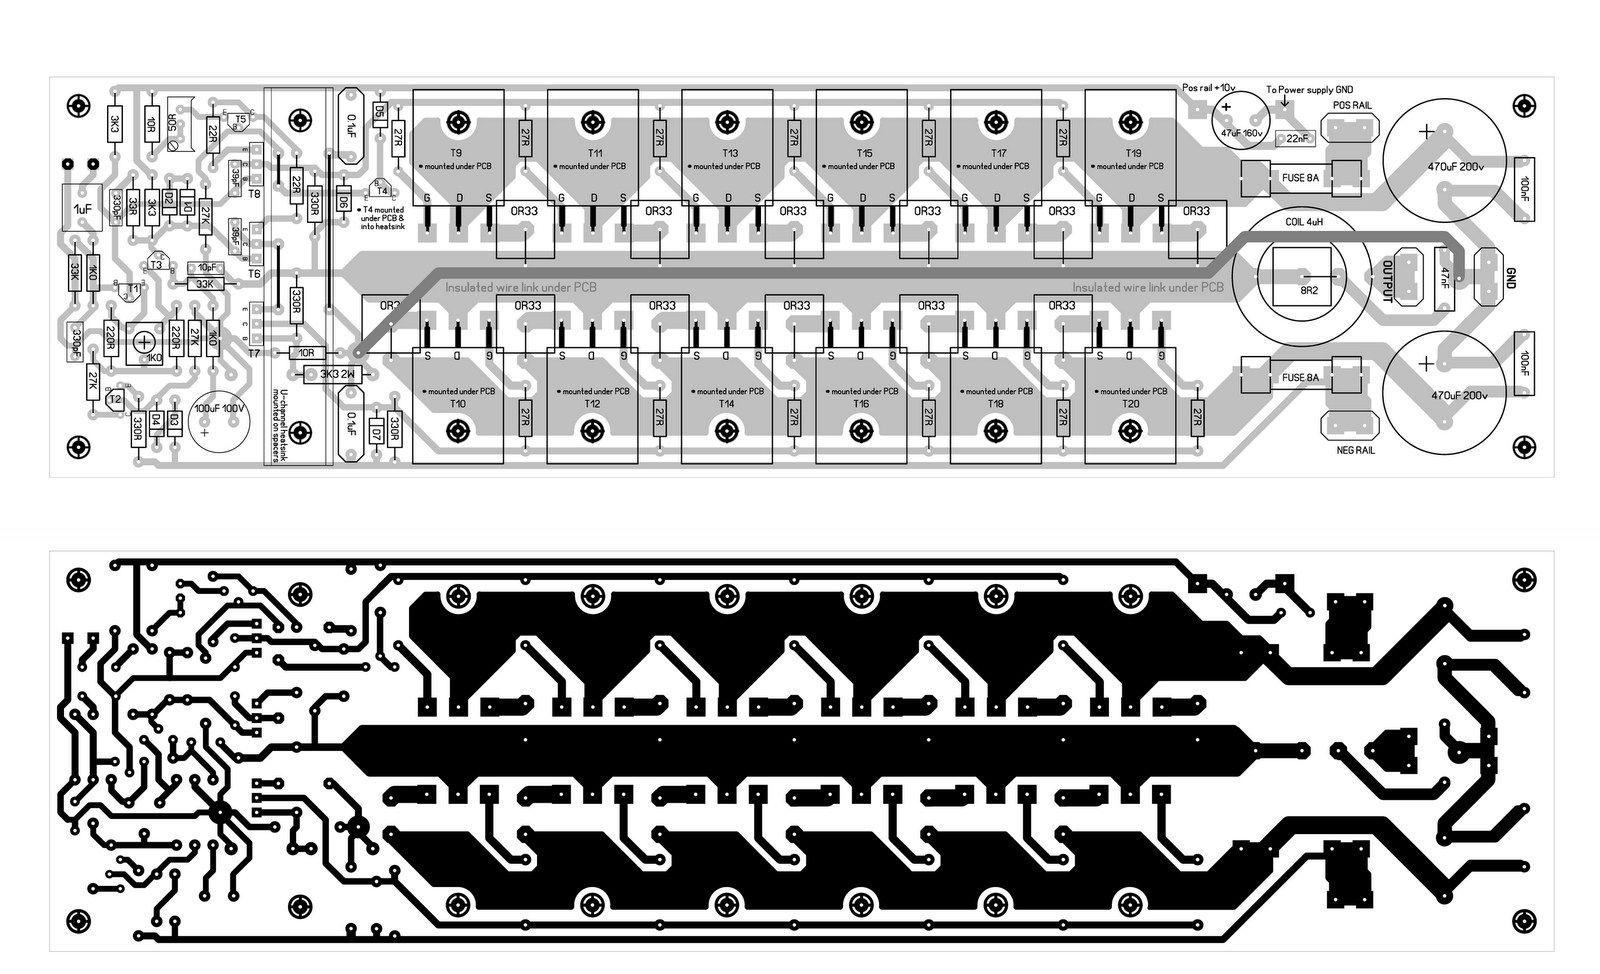 medium resolution of 600w mosfet power amplifier pcb design